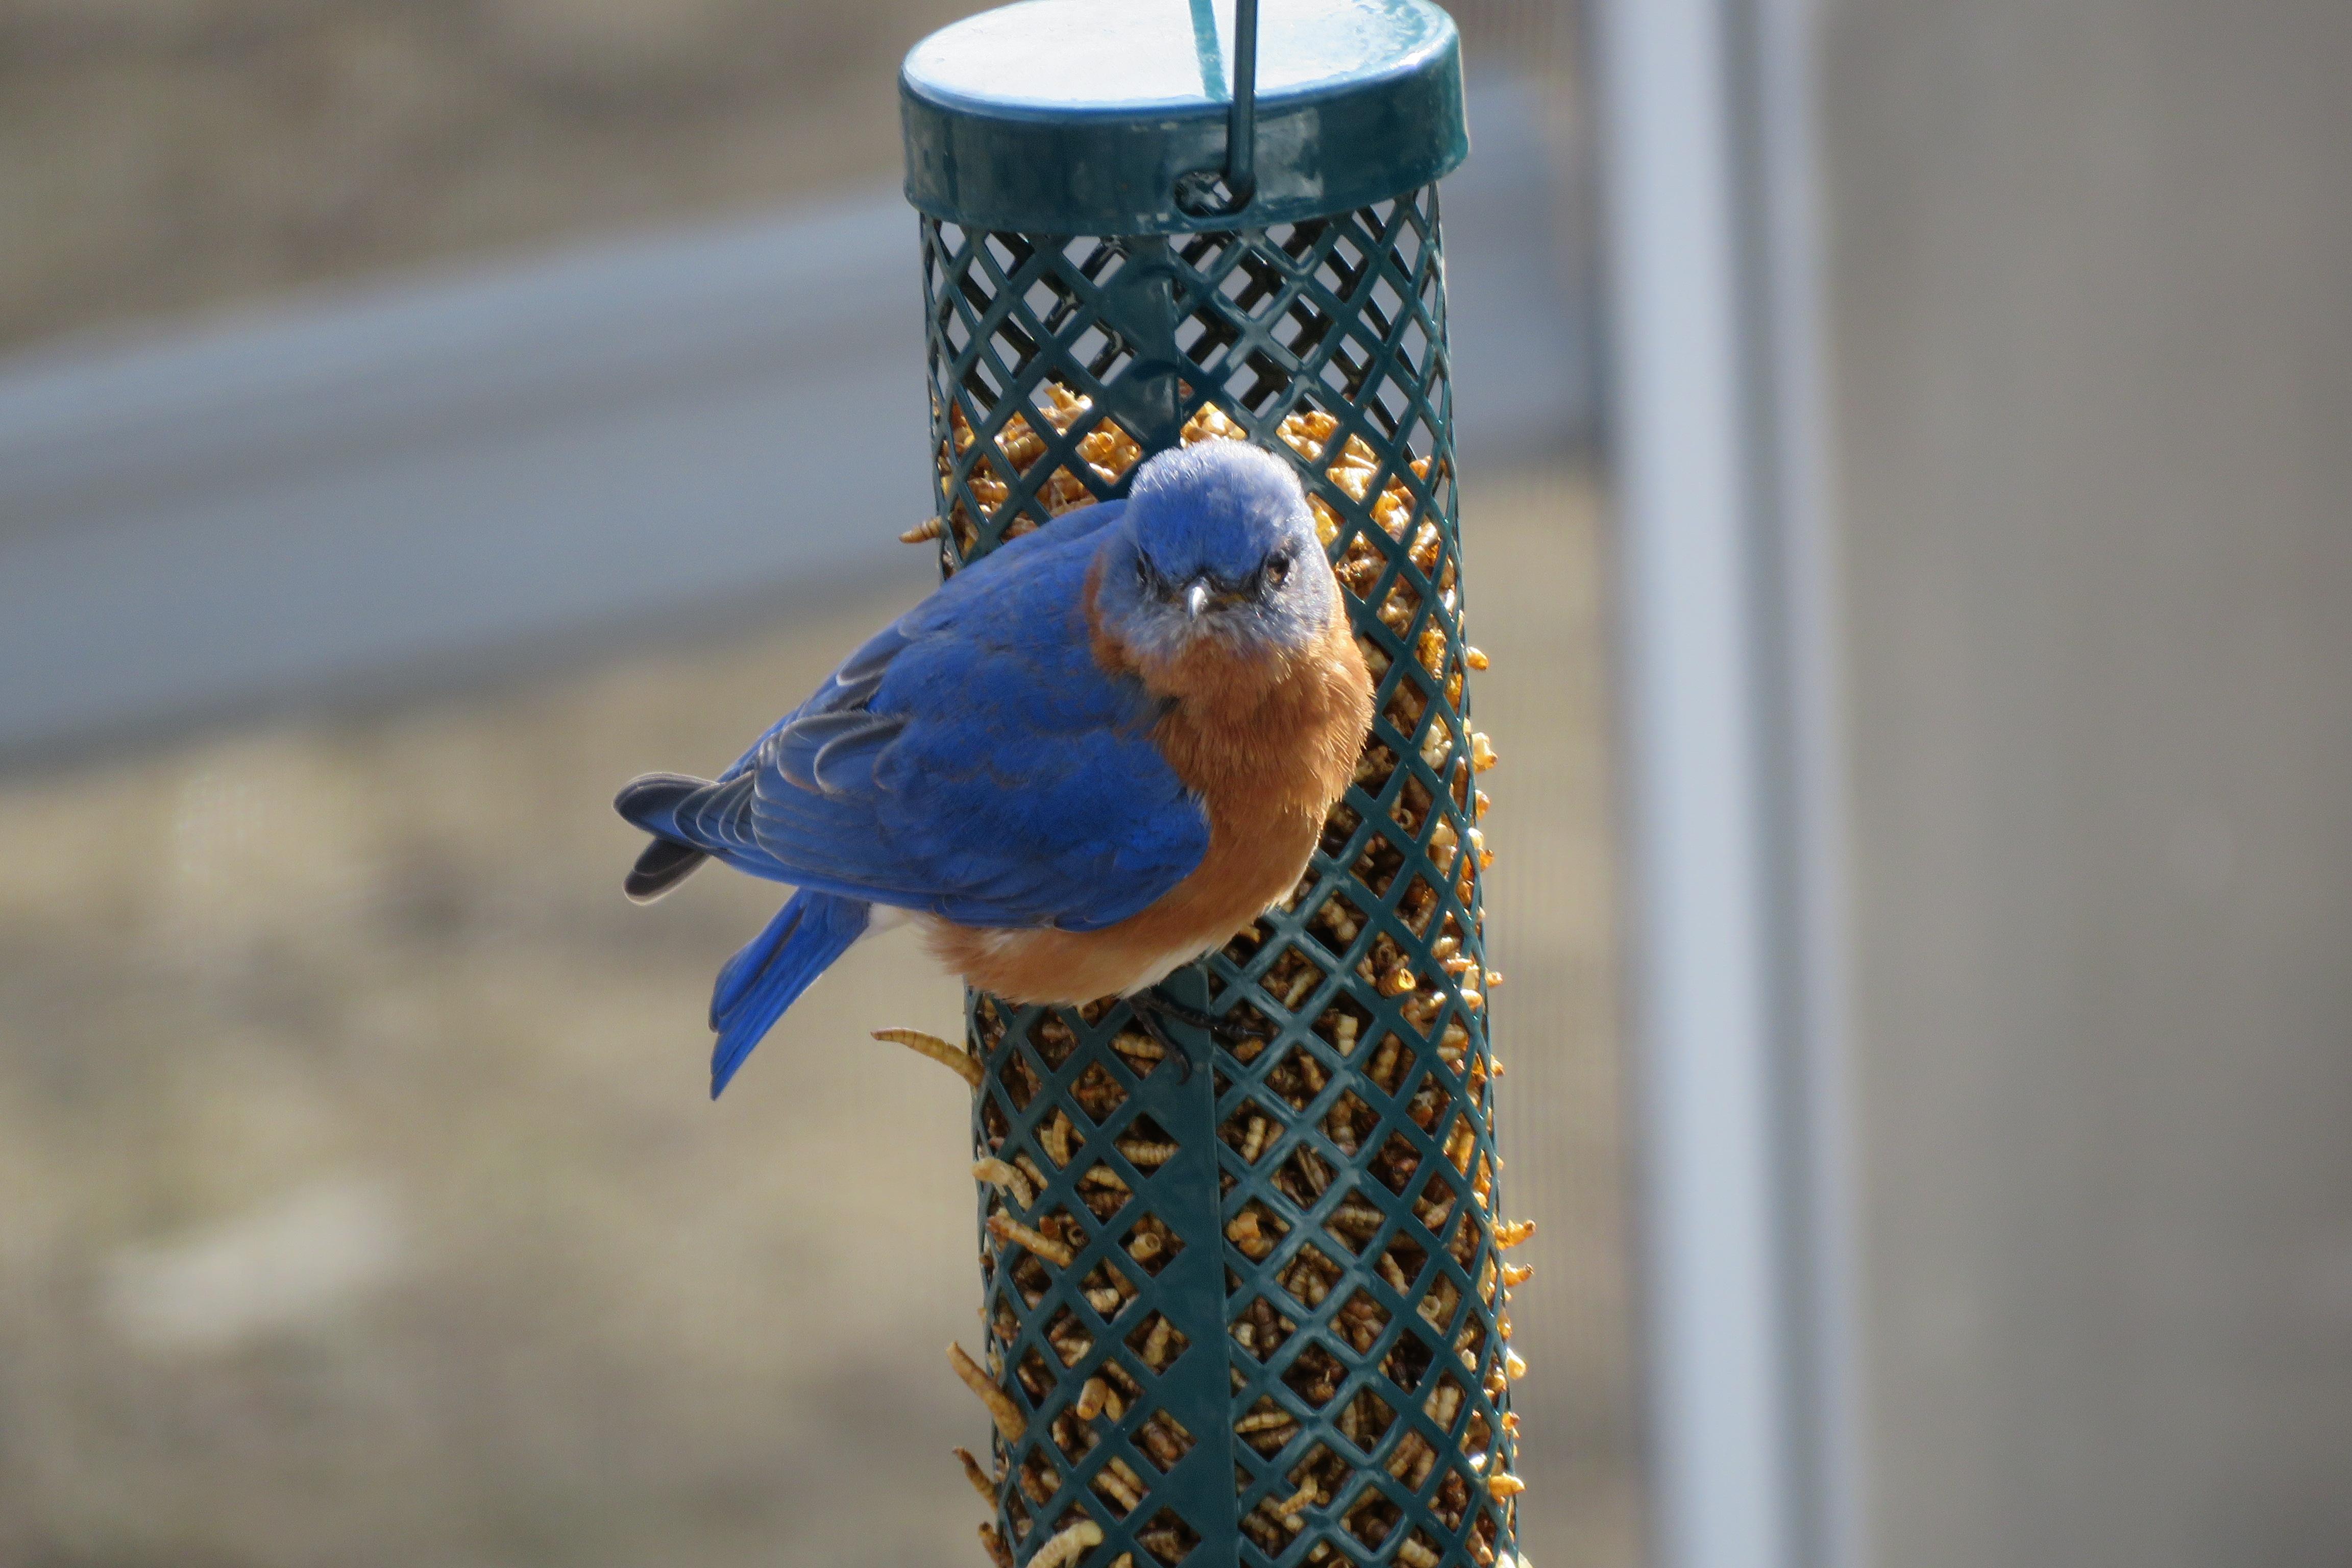 bluebird - wildlife - blue - birds - animals - mealworms - feeders